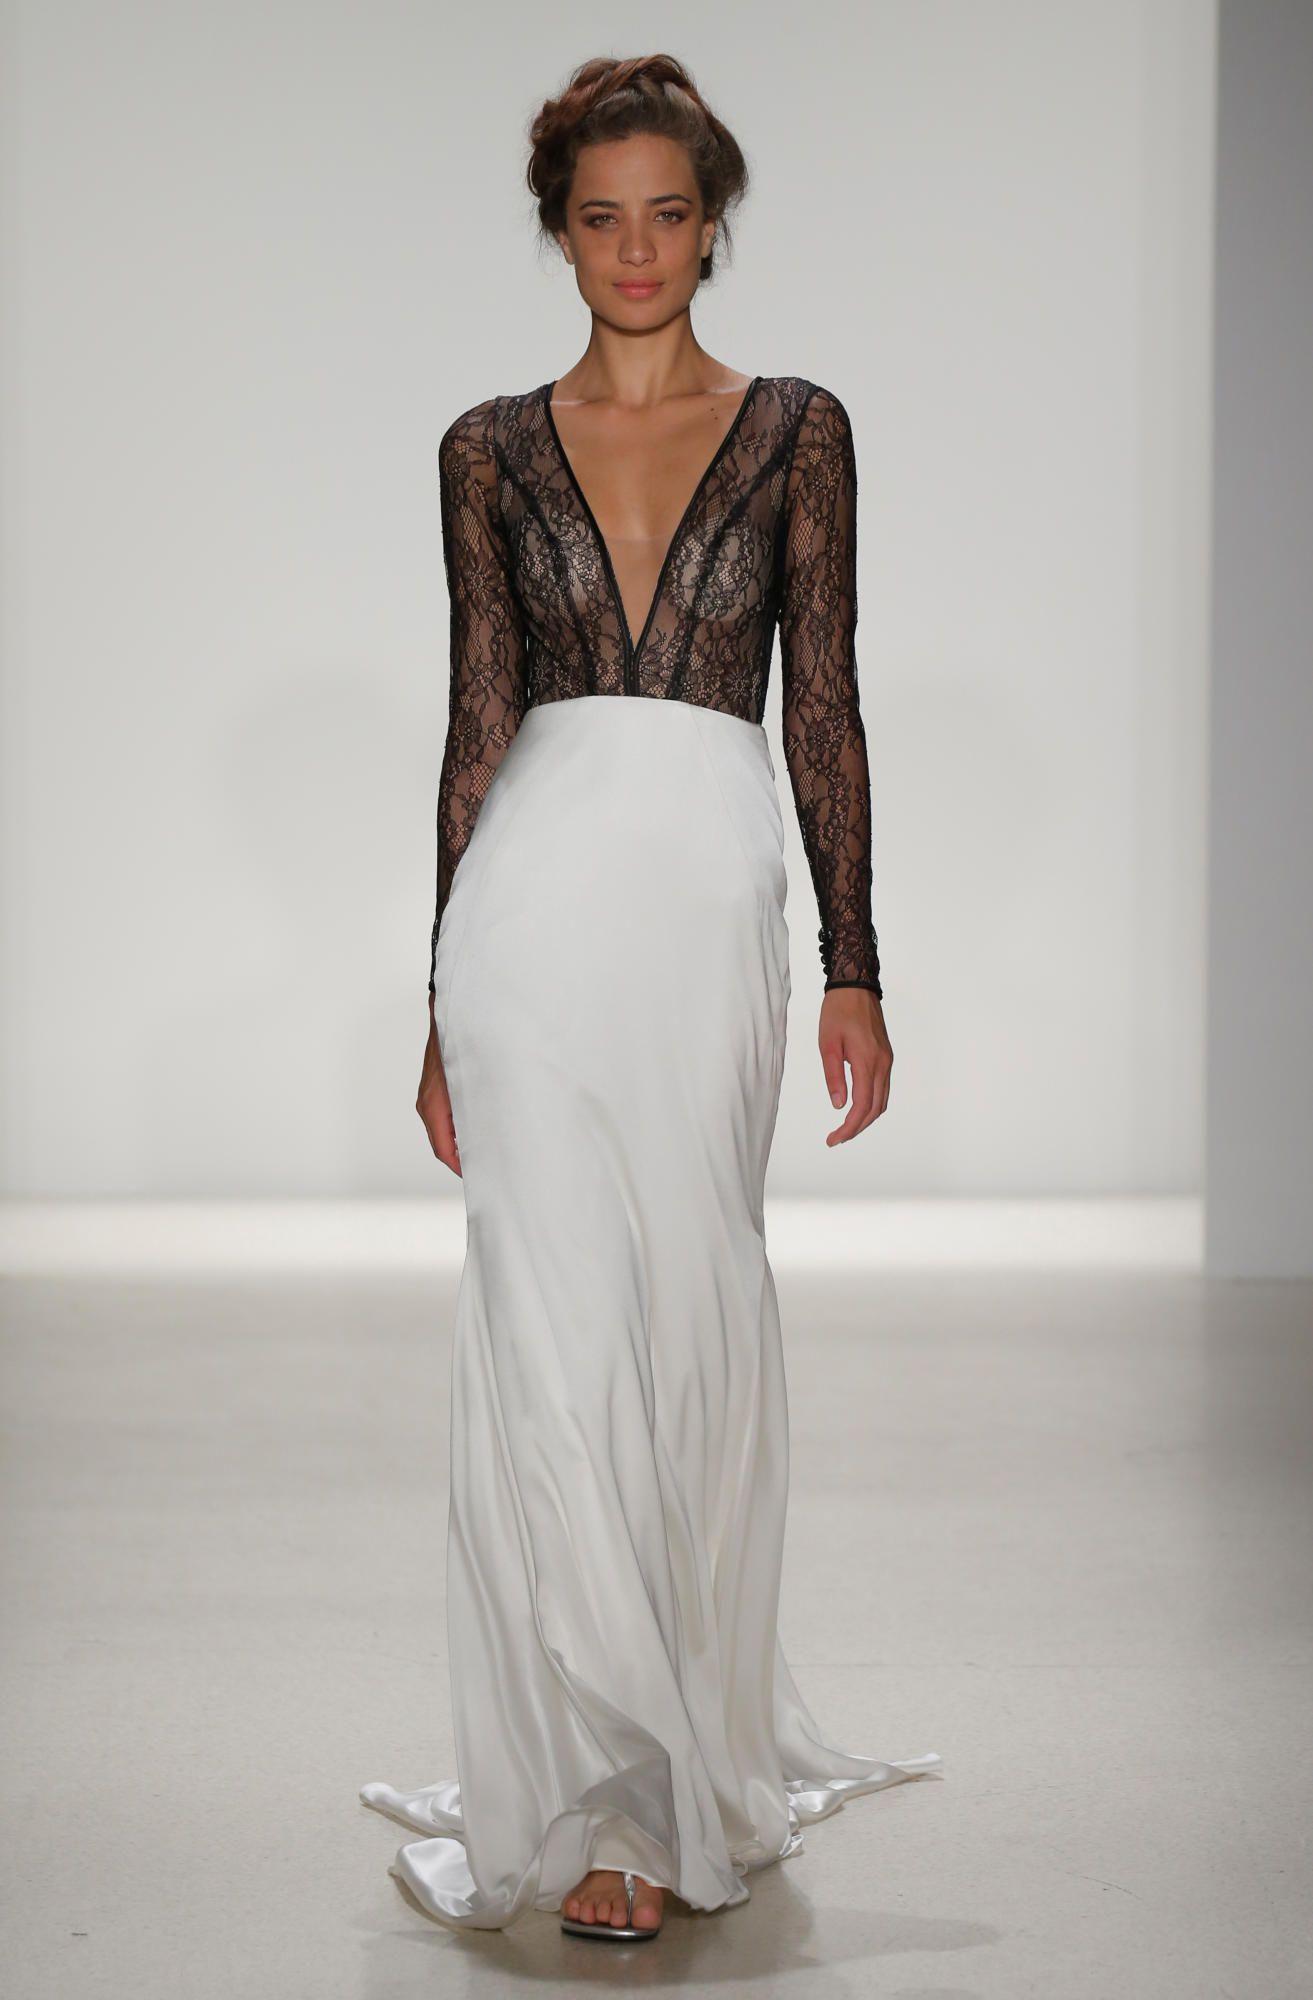 kelly-faetenini-spring-2018-bridal-black-white-dress Tendências de vestidos de noiva para 2018